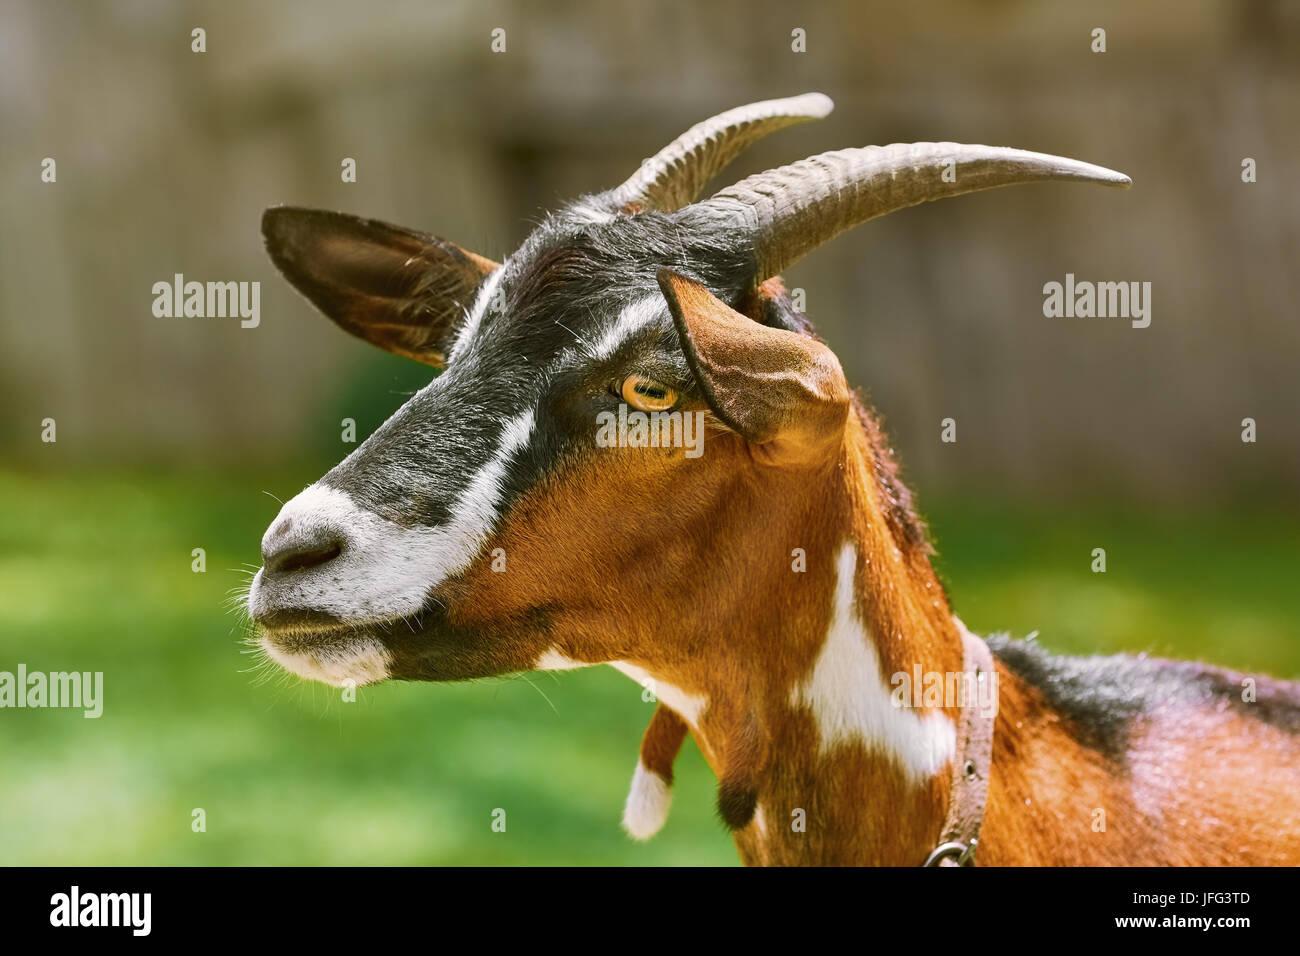 Portrait of Nanny Goat - Stock Image